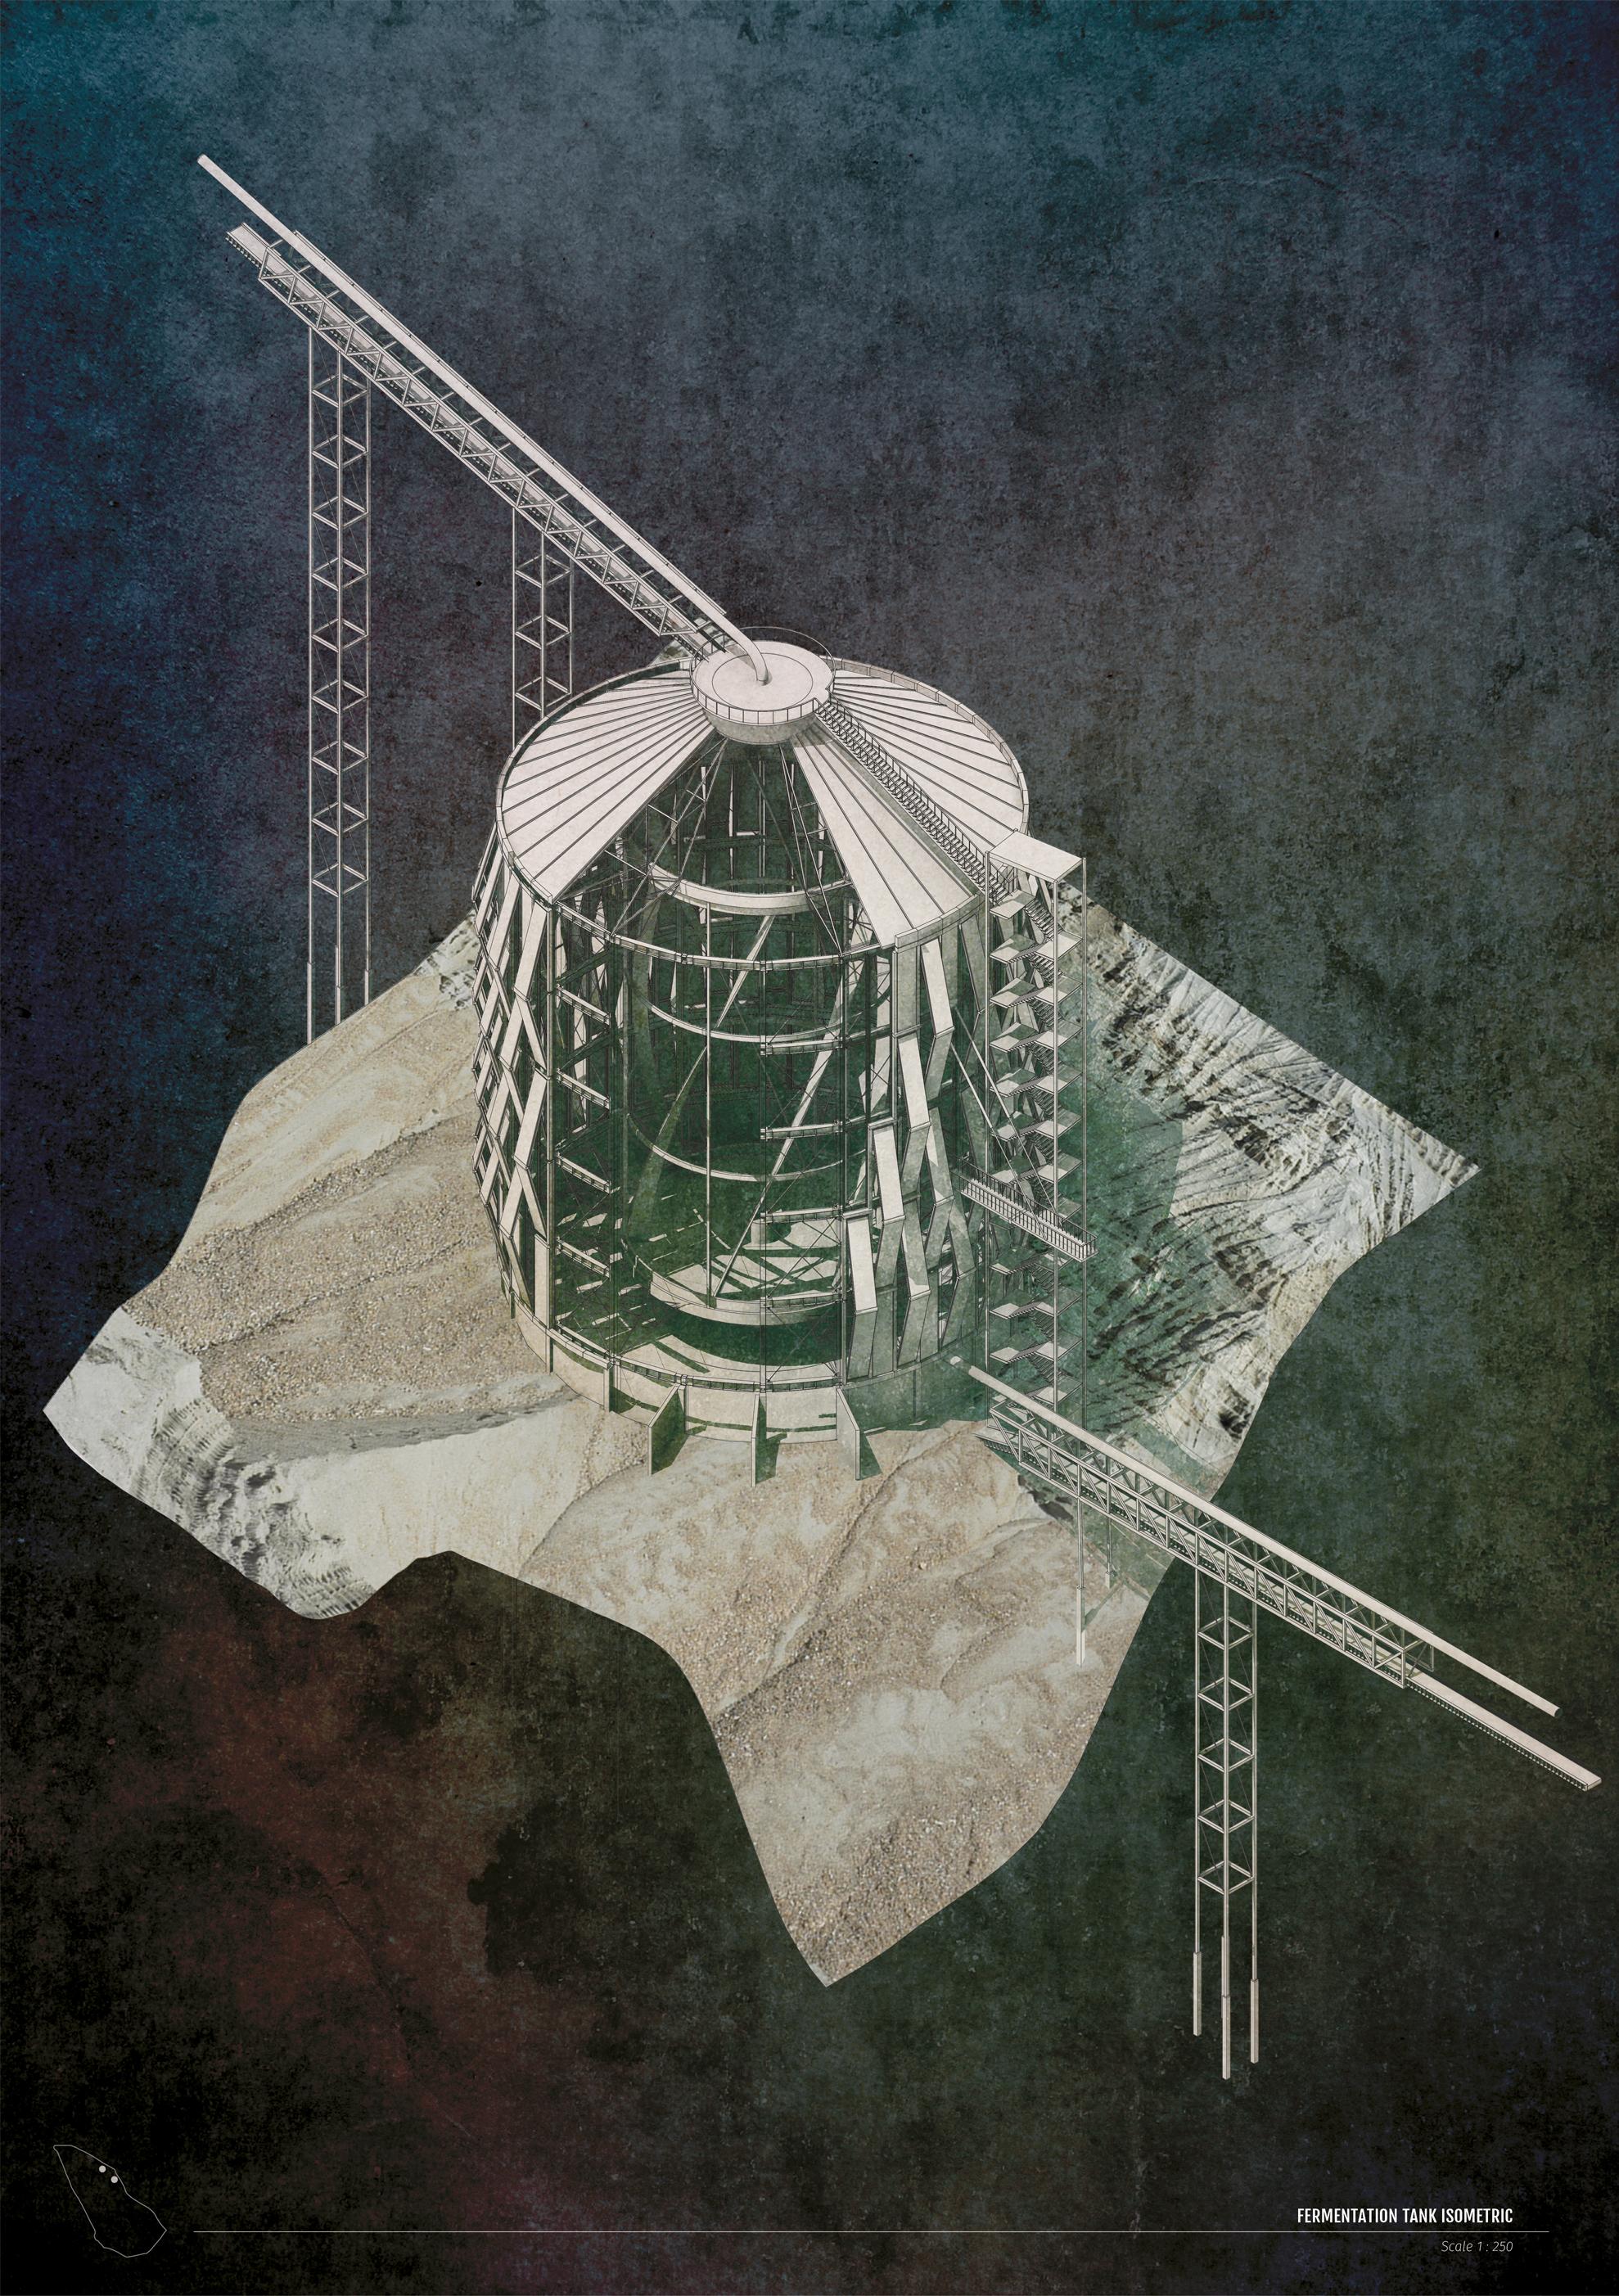 03_Fermentation Tank Isometric.jpg